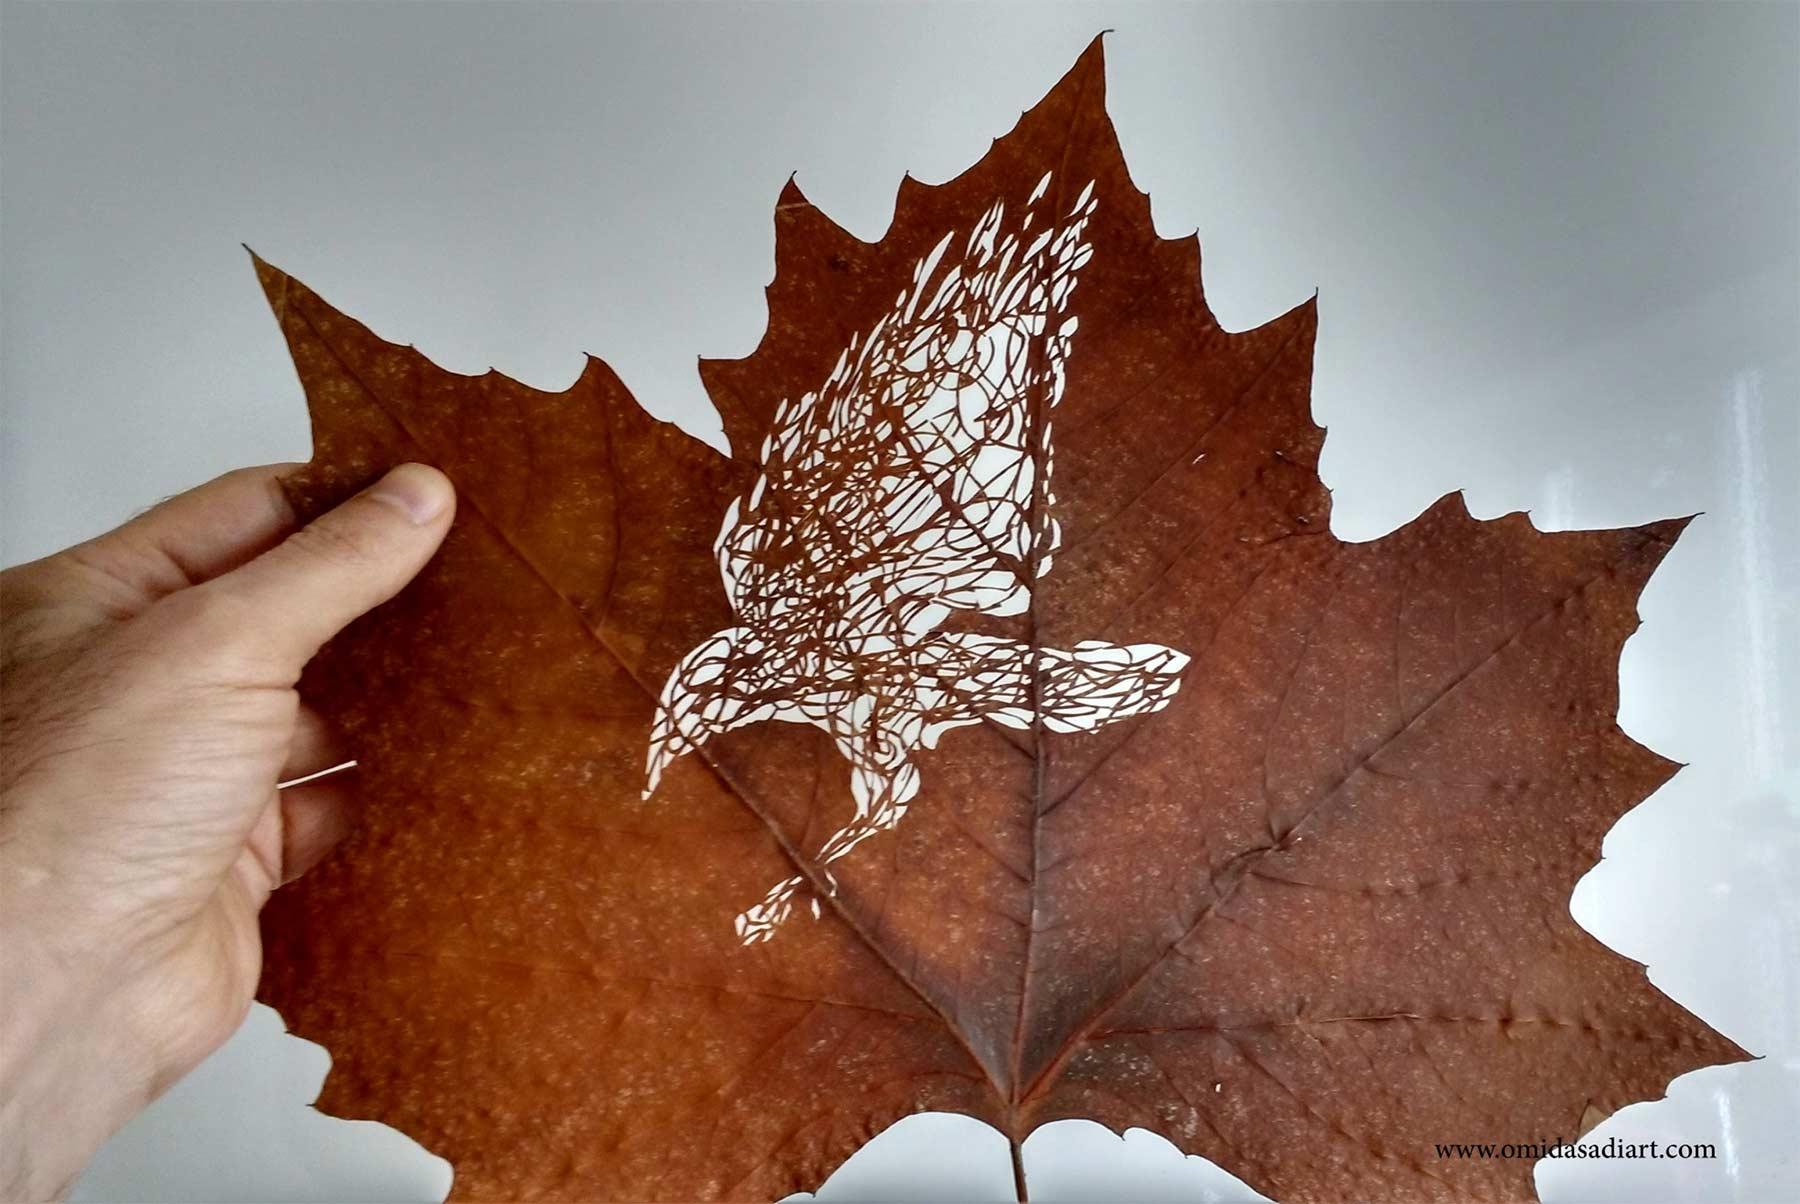 Kunstvoll geschnittene Laubblätter Omid-Asadi-leaf-art_04